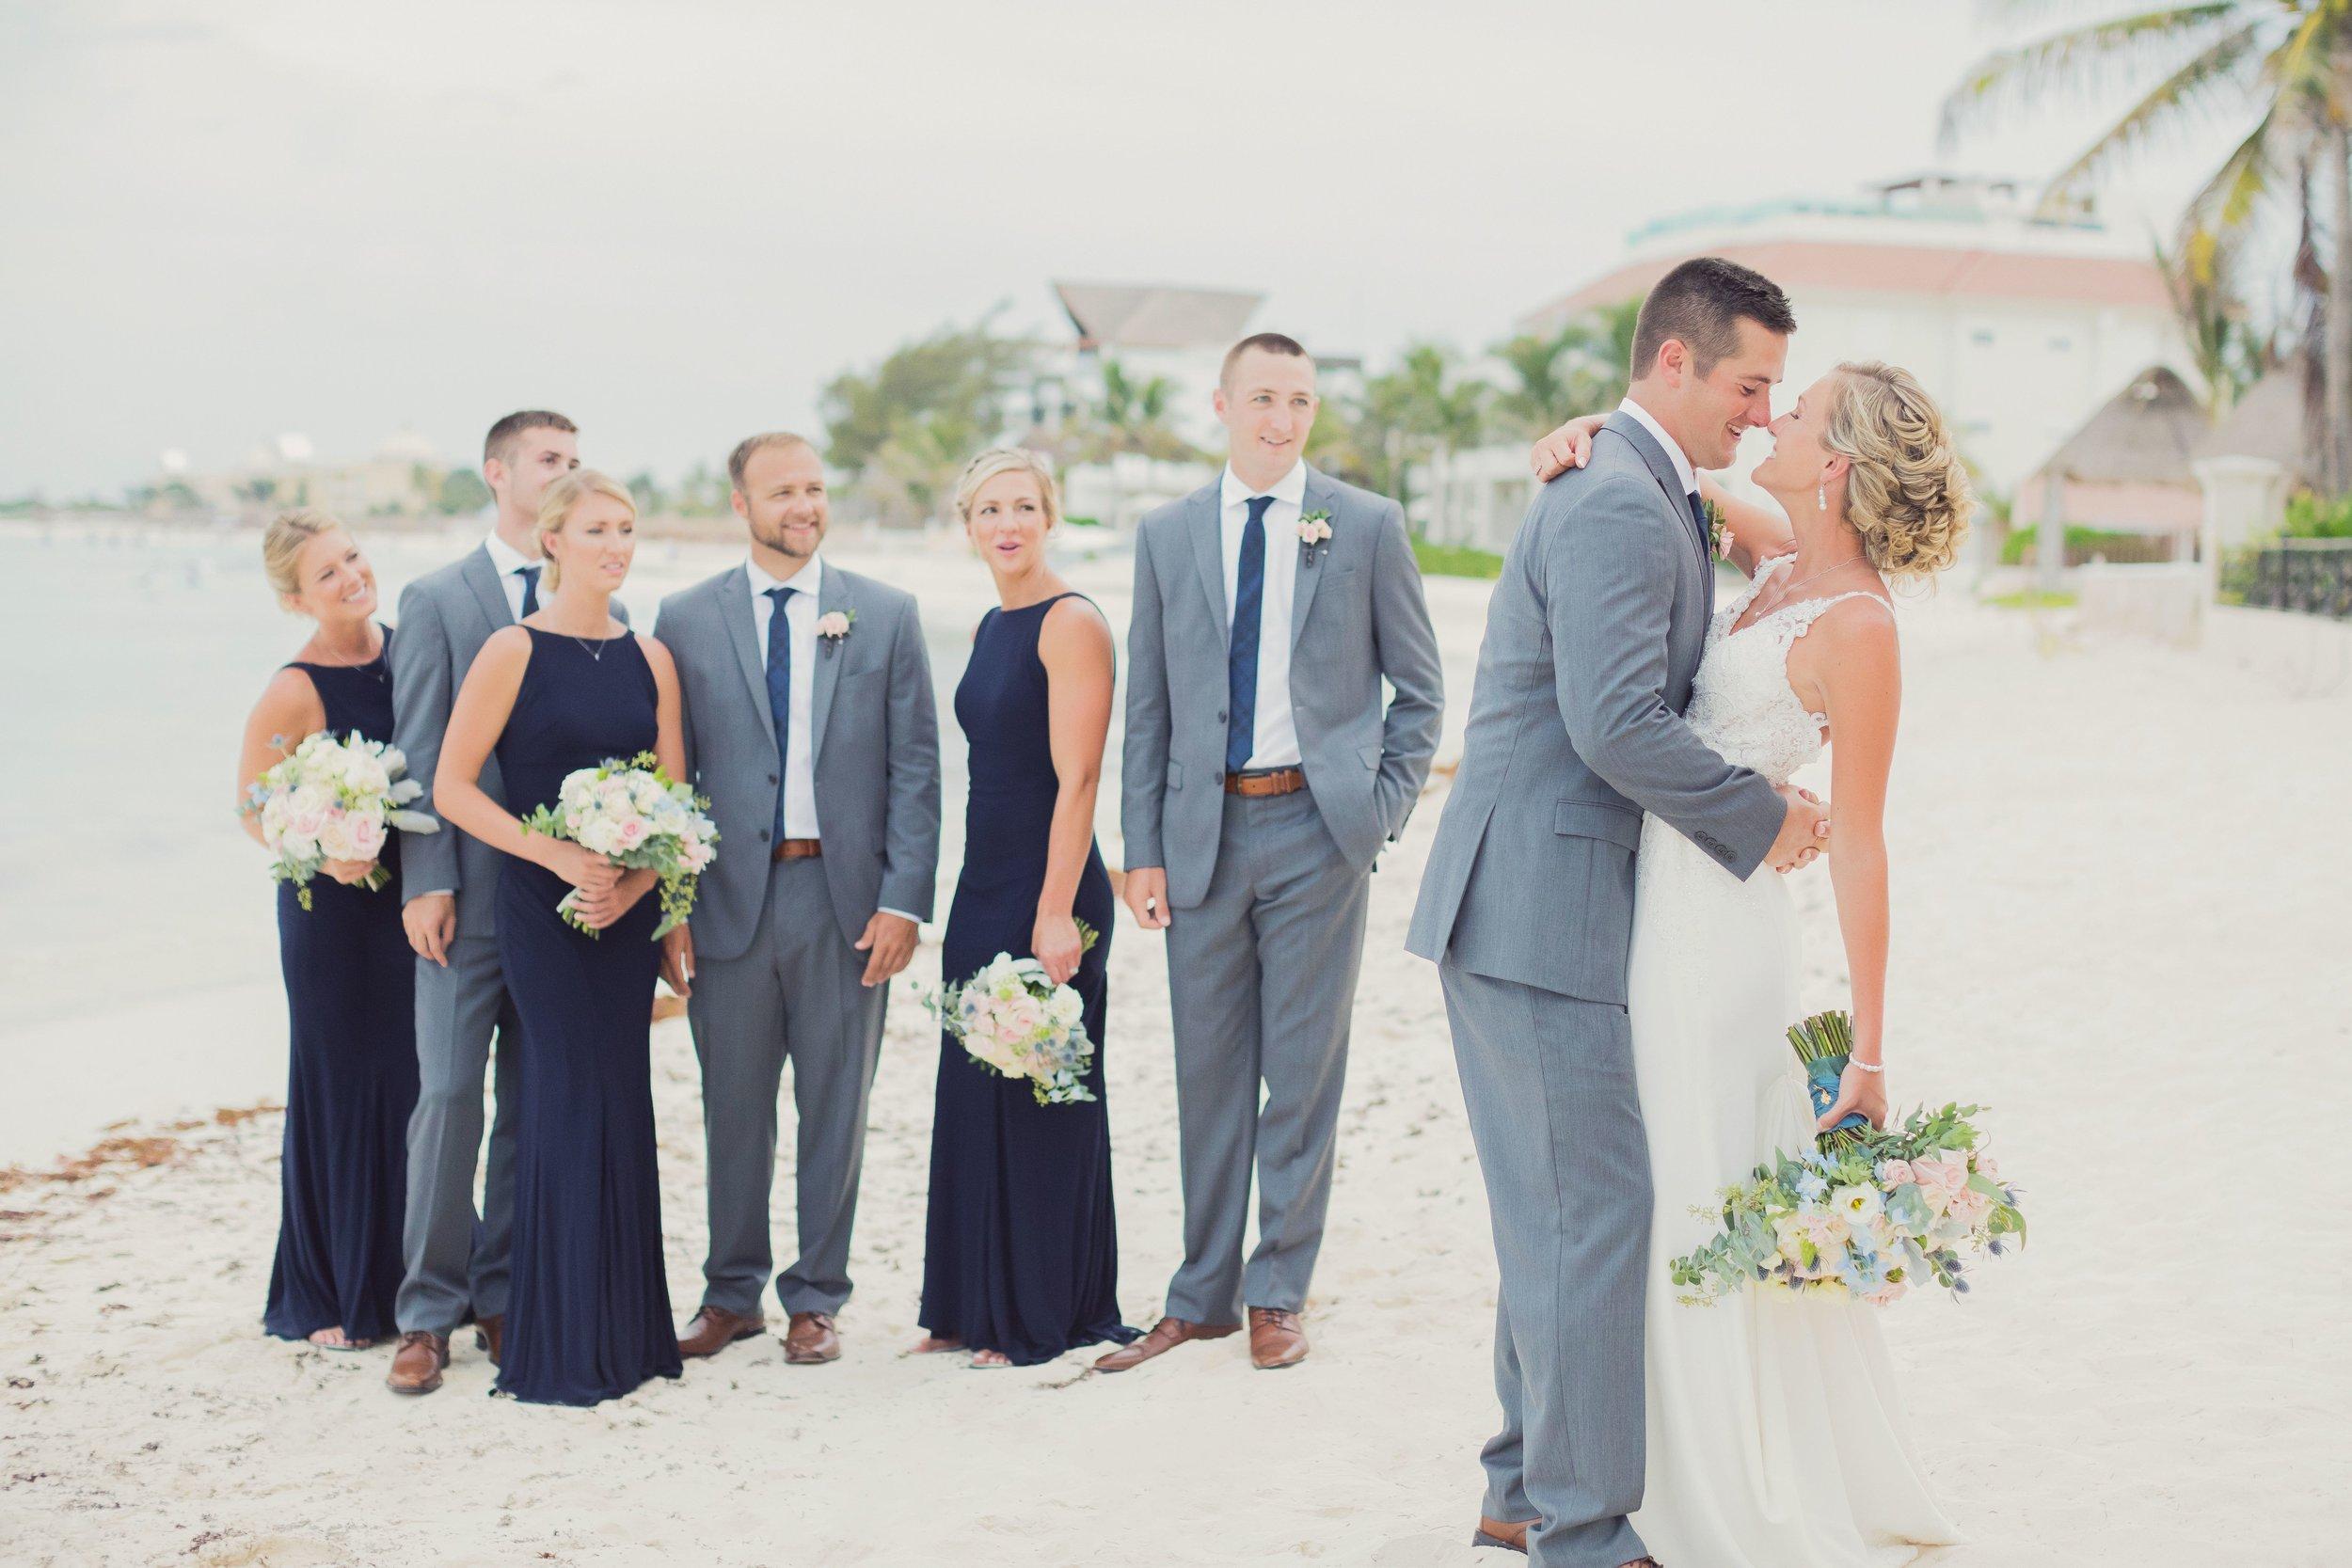 cancun-wedding-venue-villa-la-joya-945 copy-websize.jpg